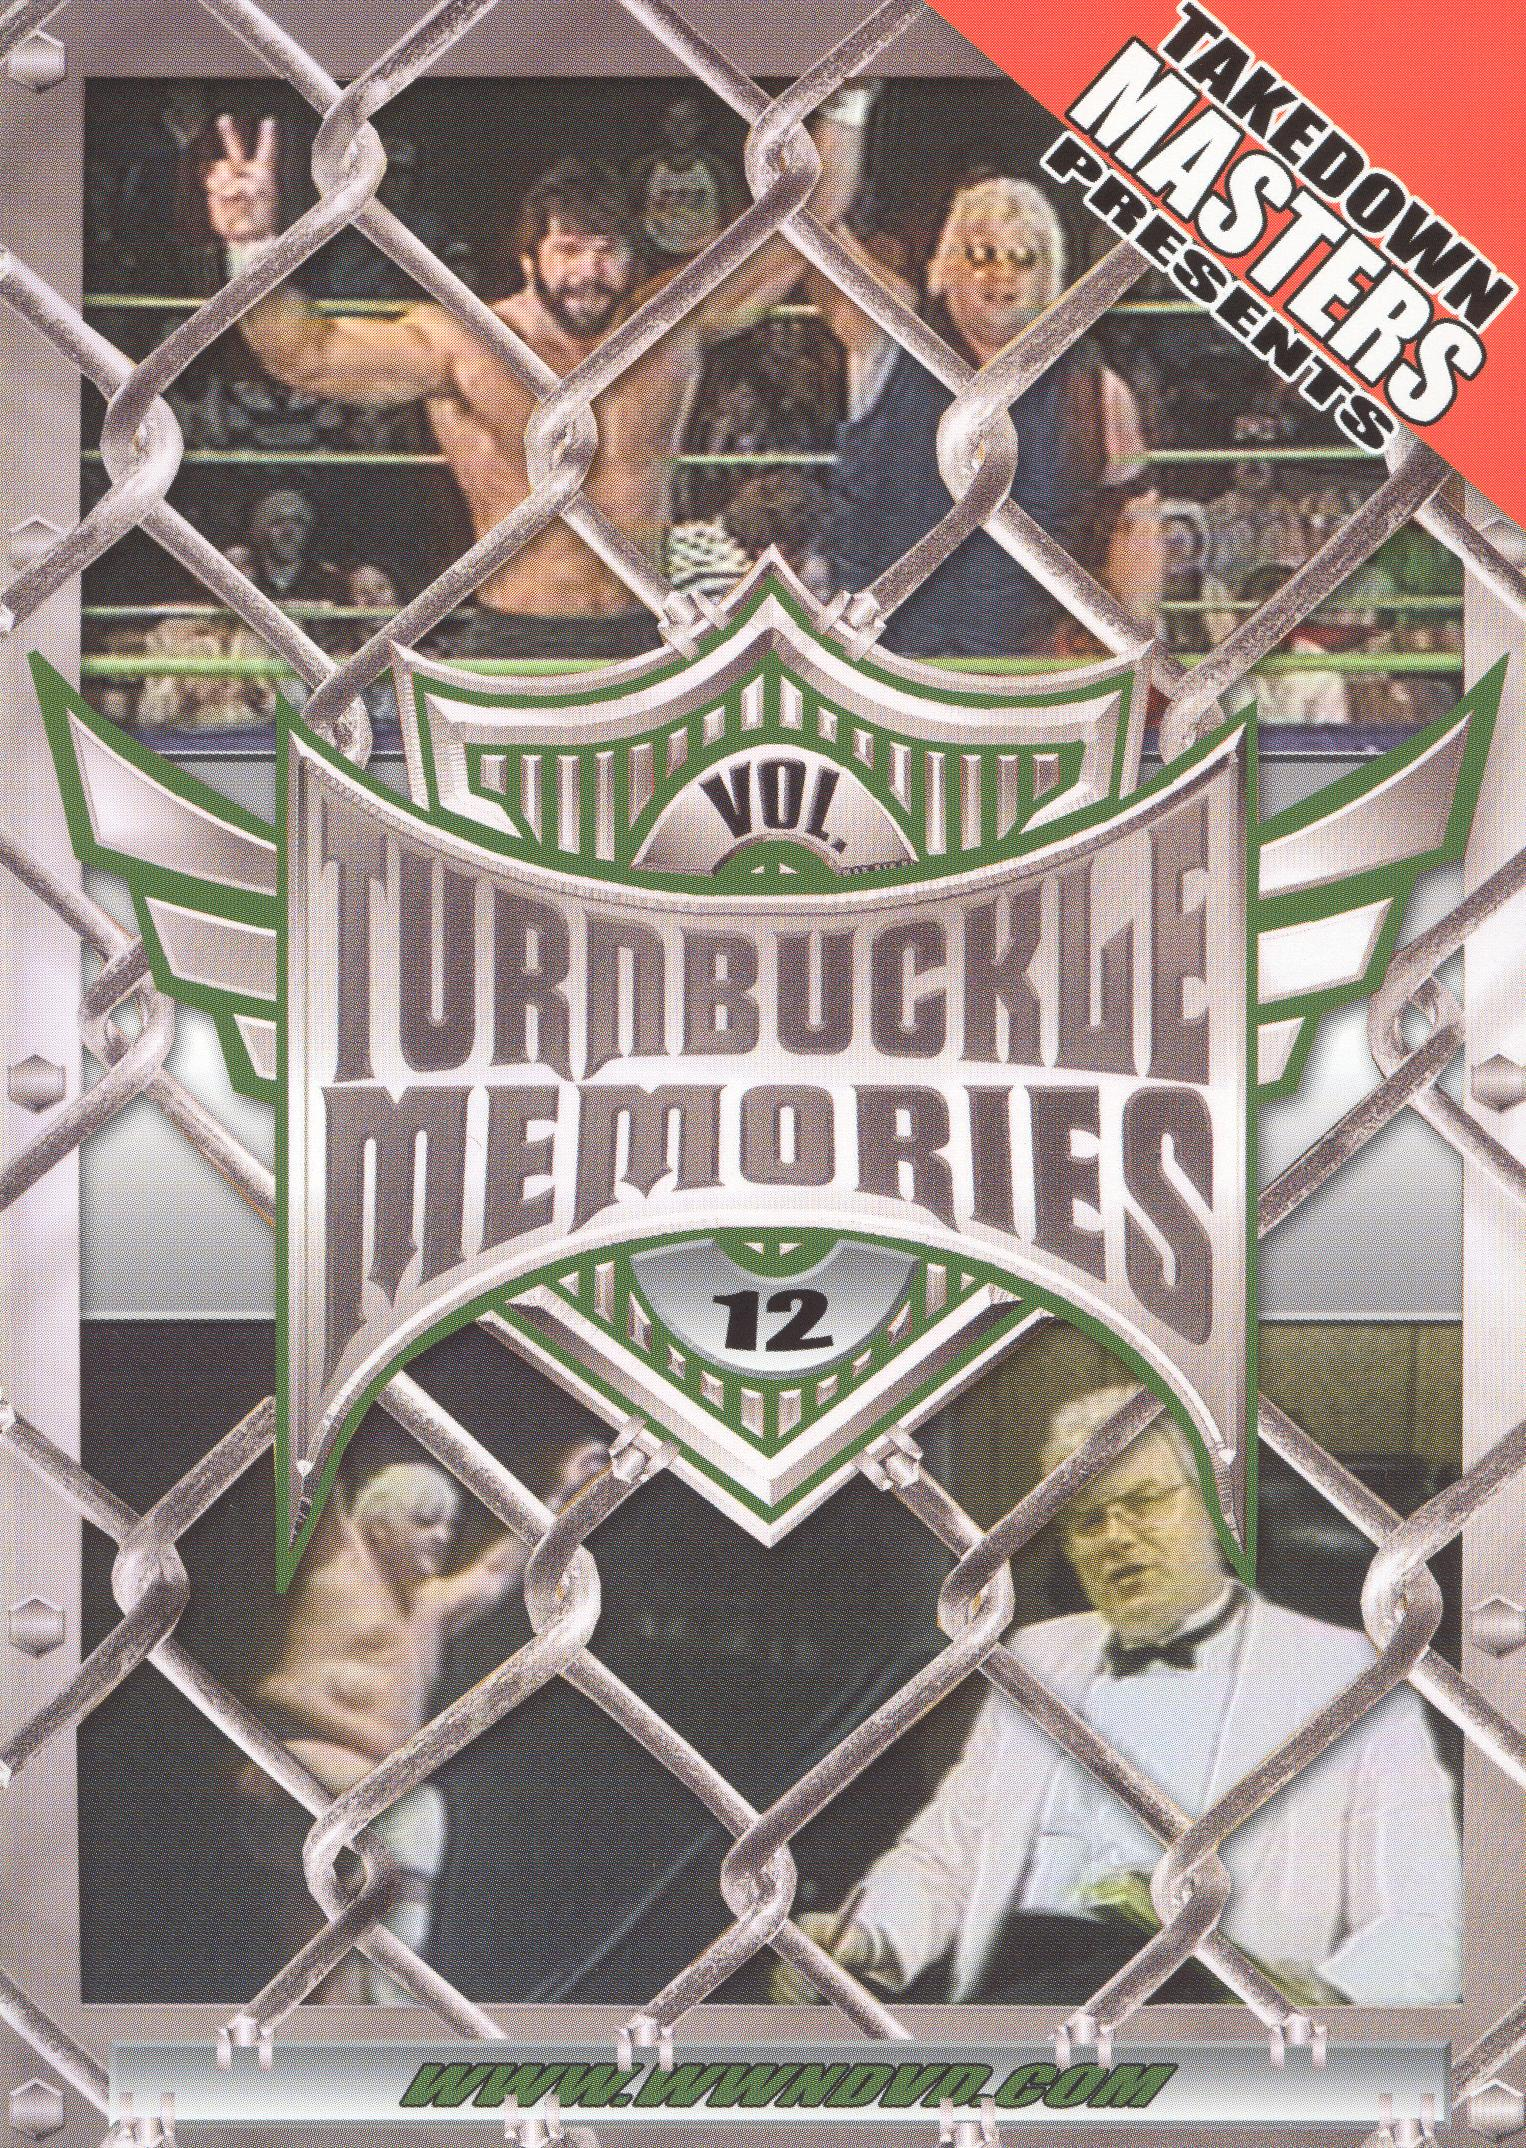 Takedown Masters: Turnbuckle Memories, Vol. 12